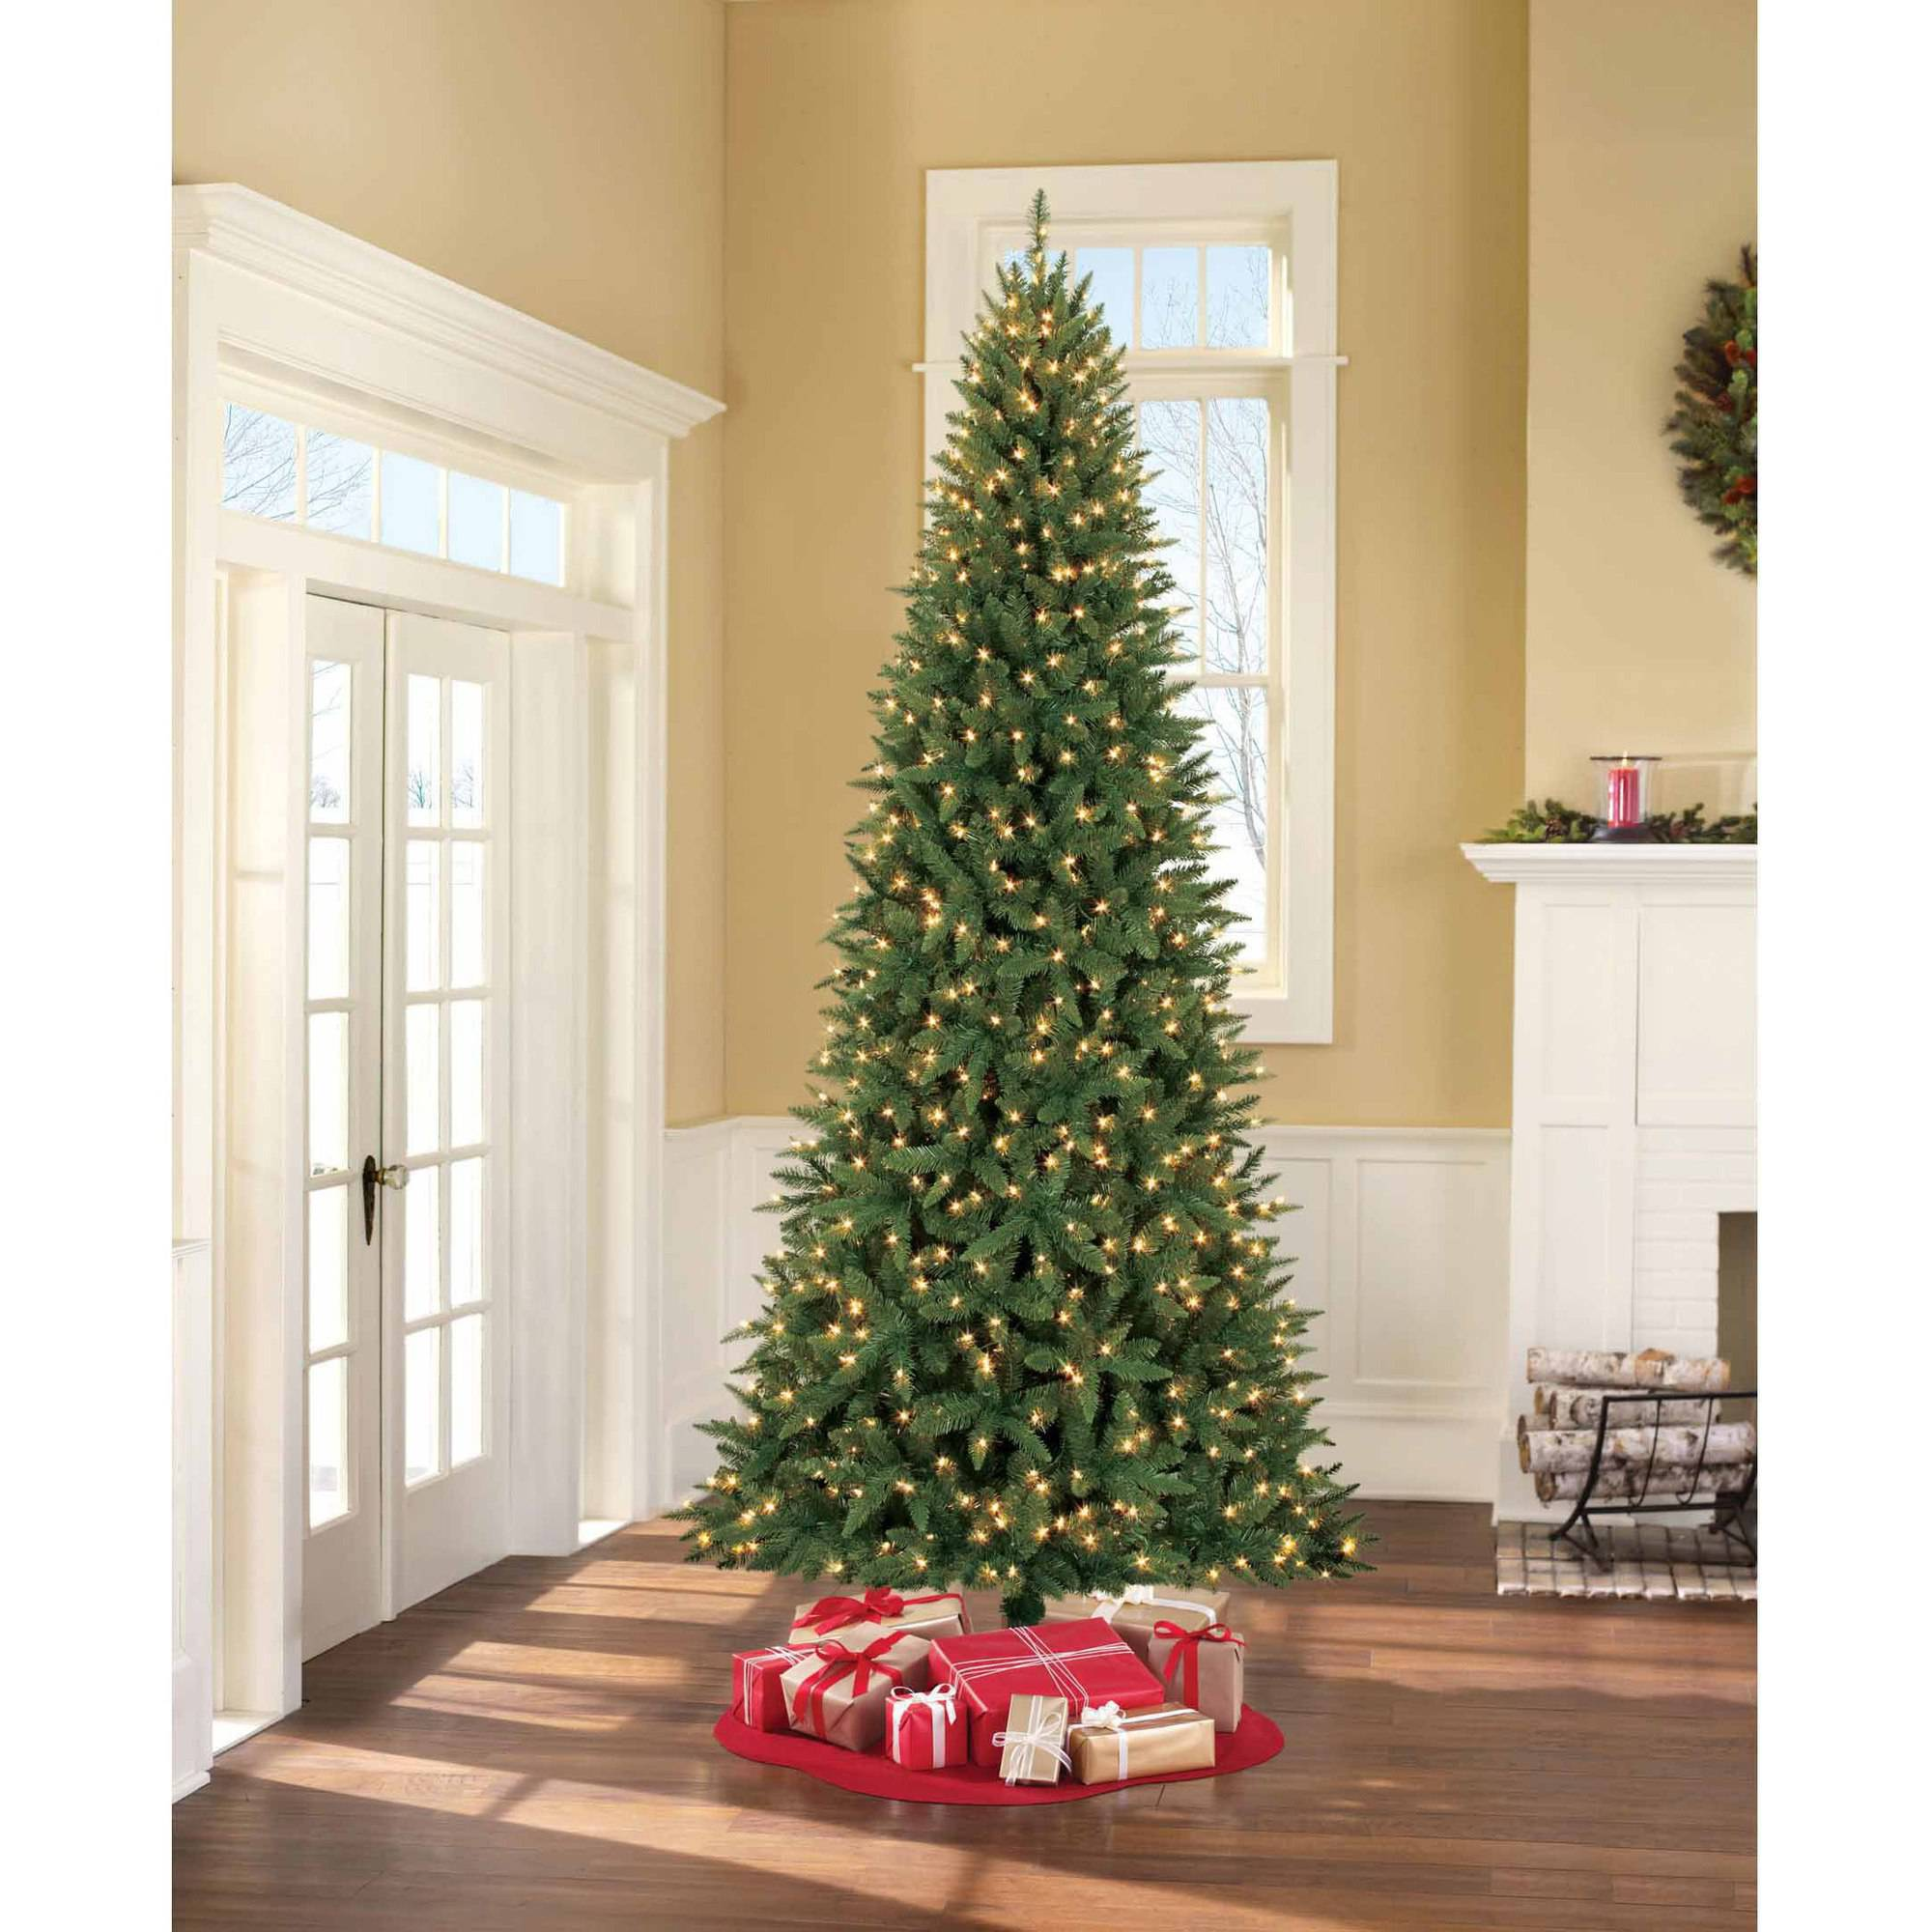 Artificial Christmas Tree Pre Lit 9u0027 Williams Pine, Clear Lights    Walmart.com